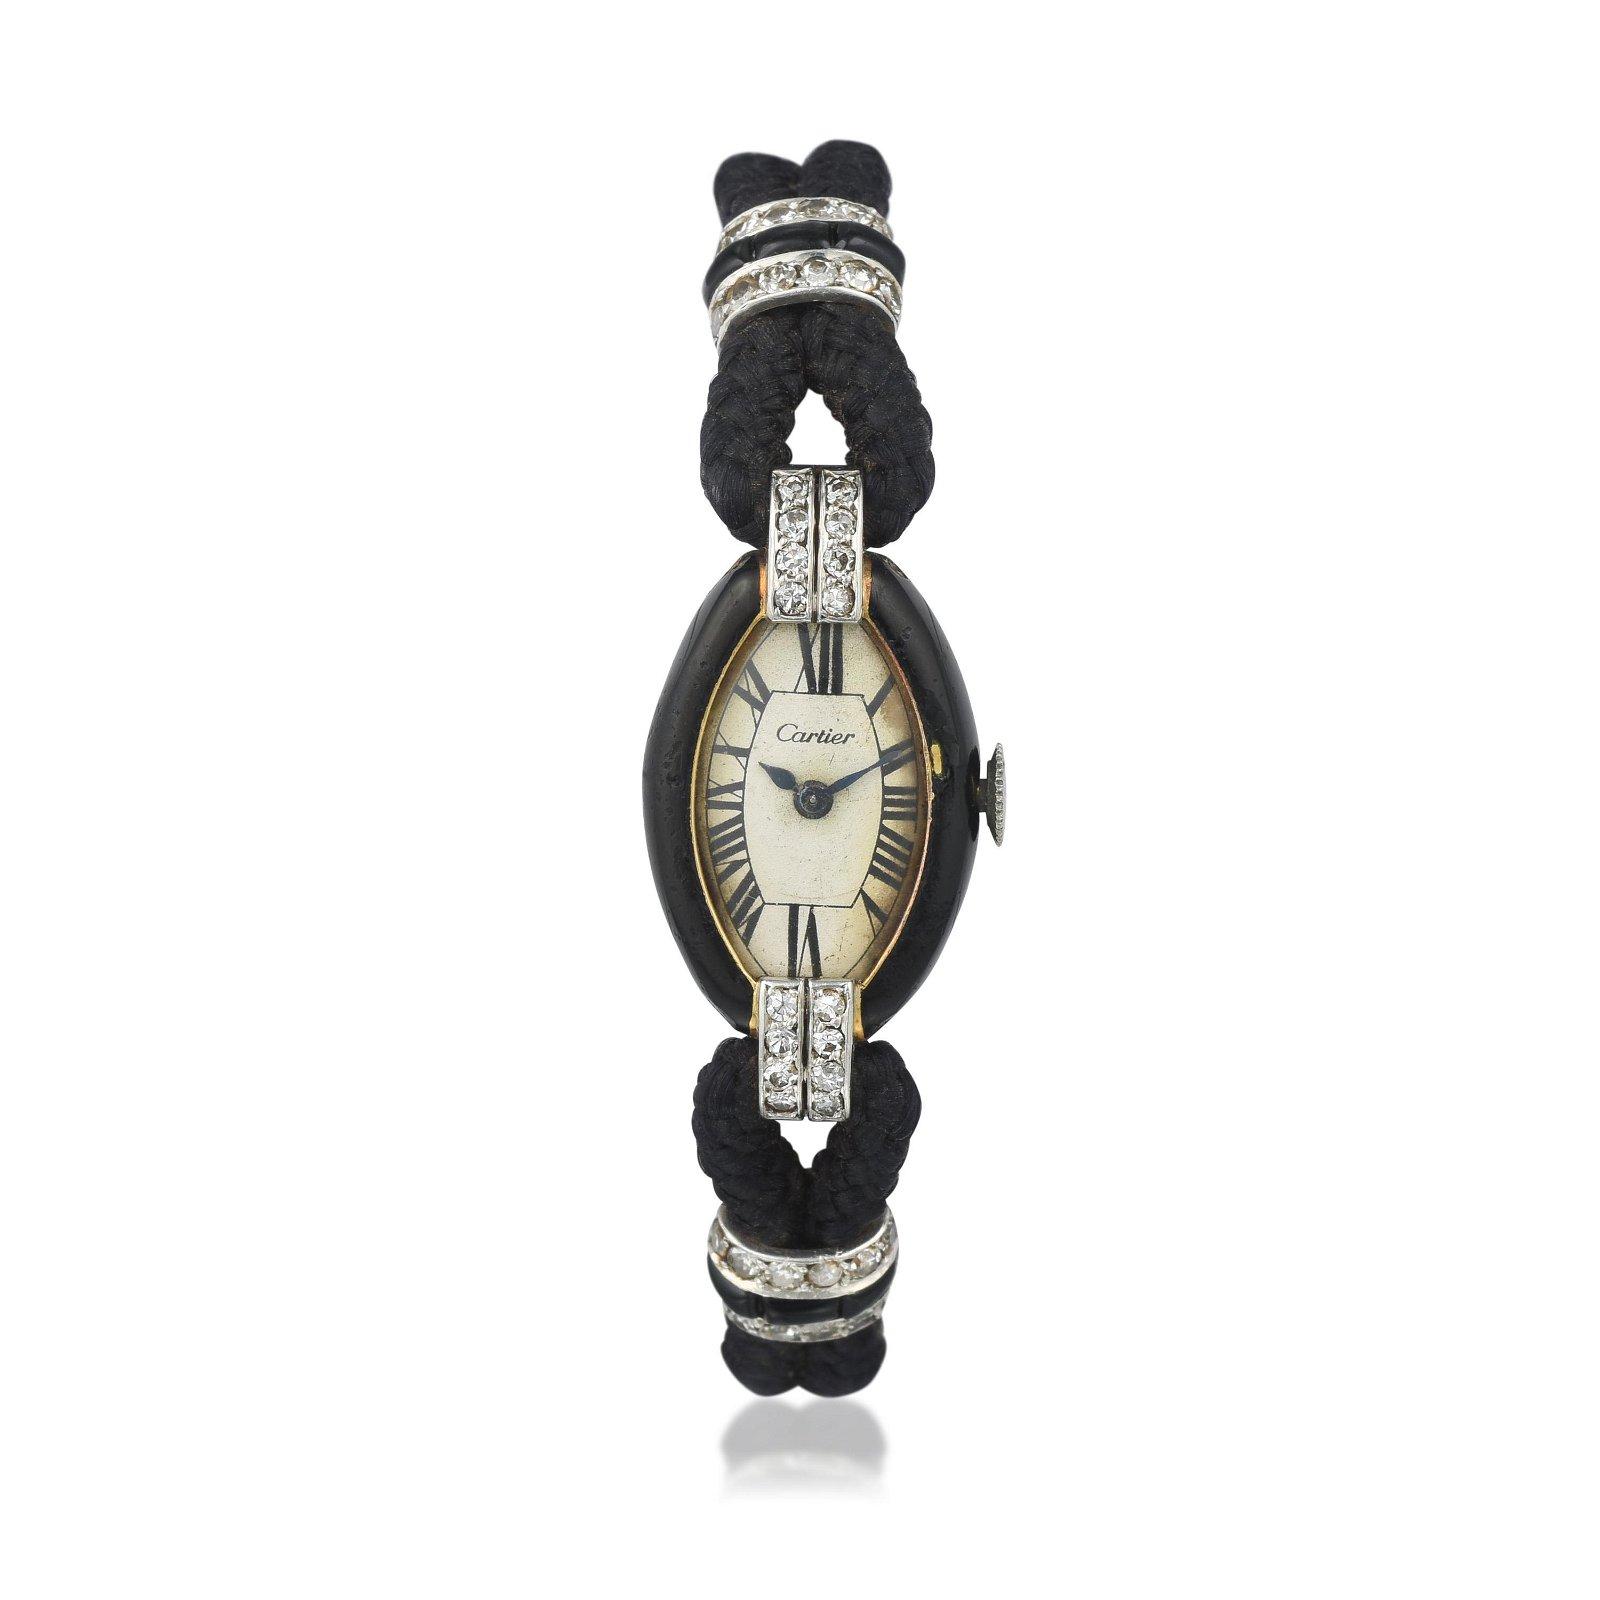 Cartier Art Deco Enamel and Diamond Watch